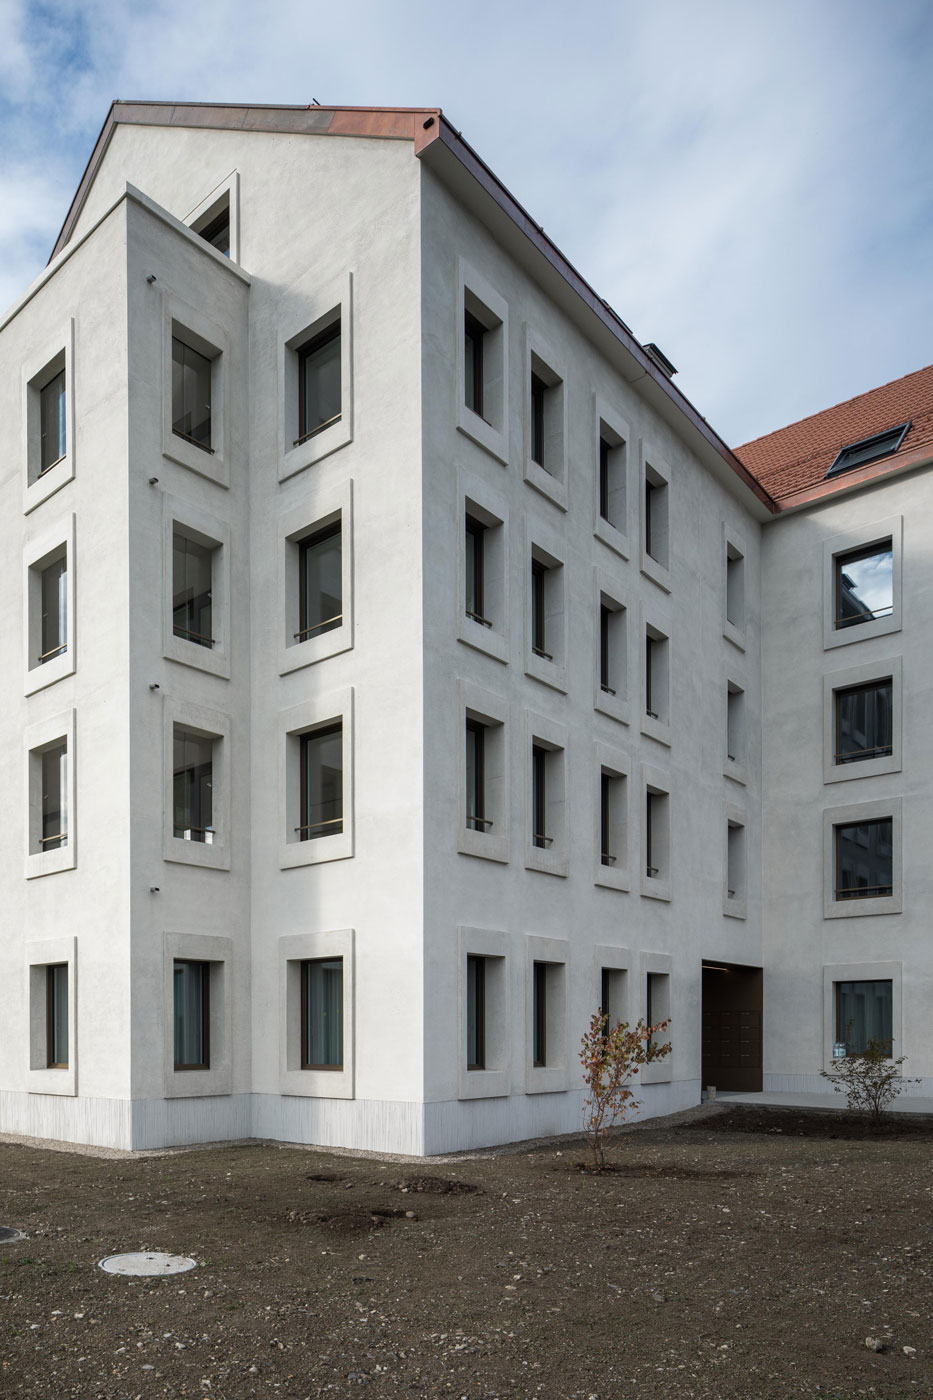 M lihof alberswil bob gysin partner bgp - Bob gysin partner bgp architekten ...